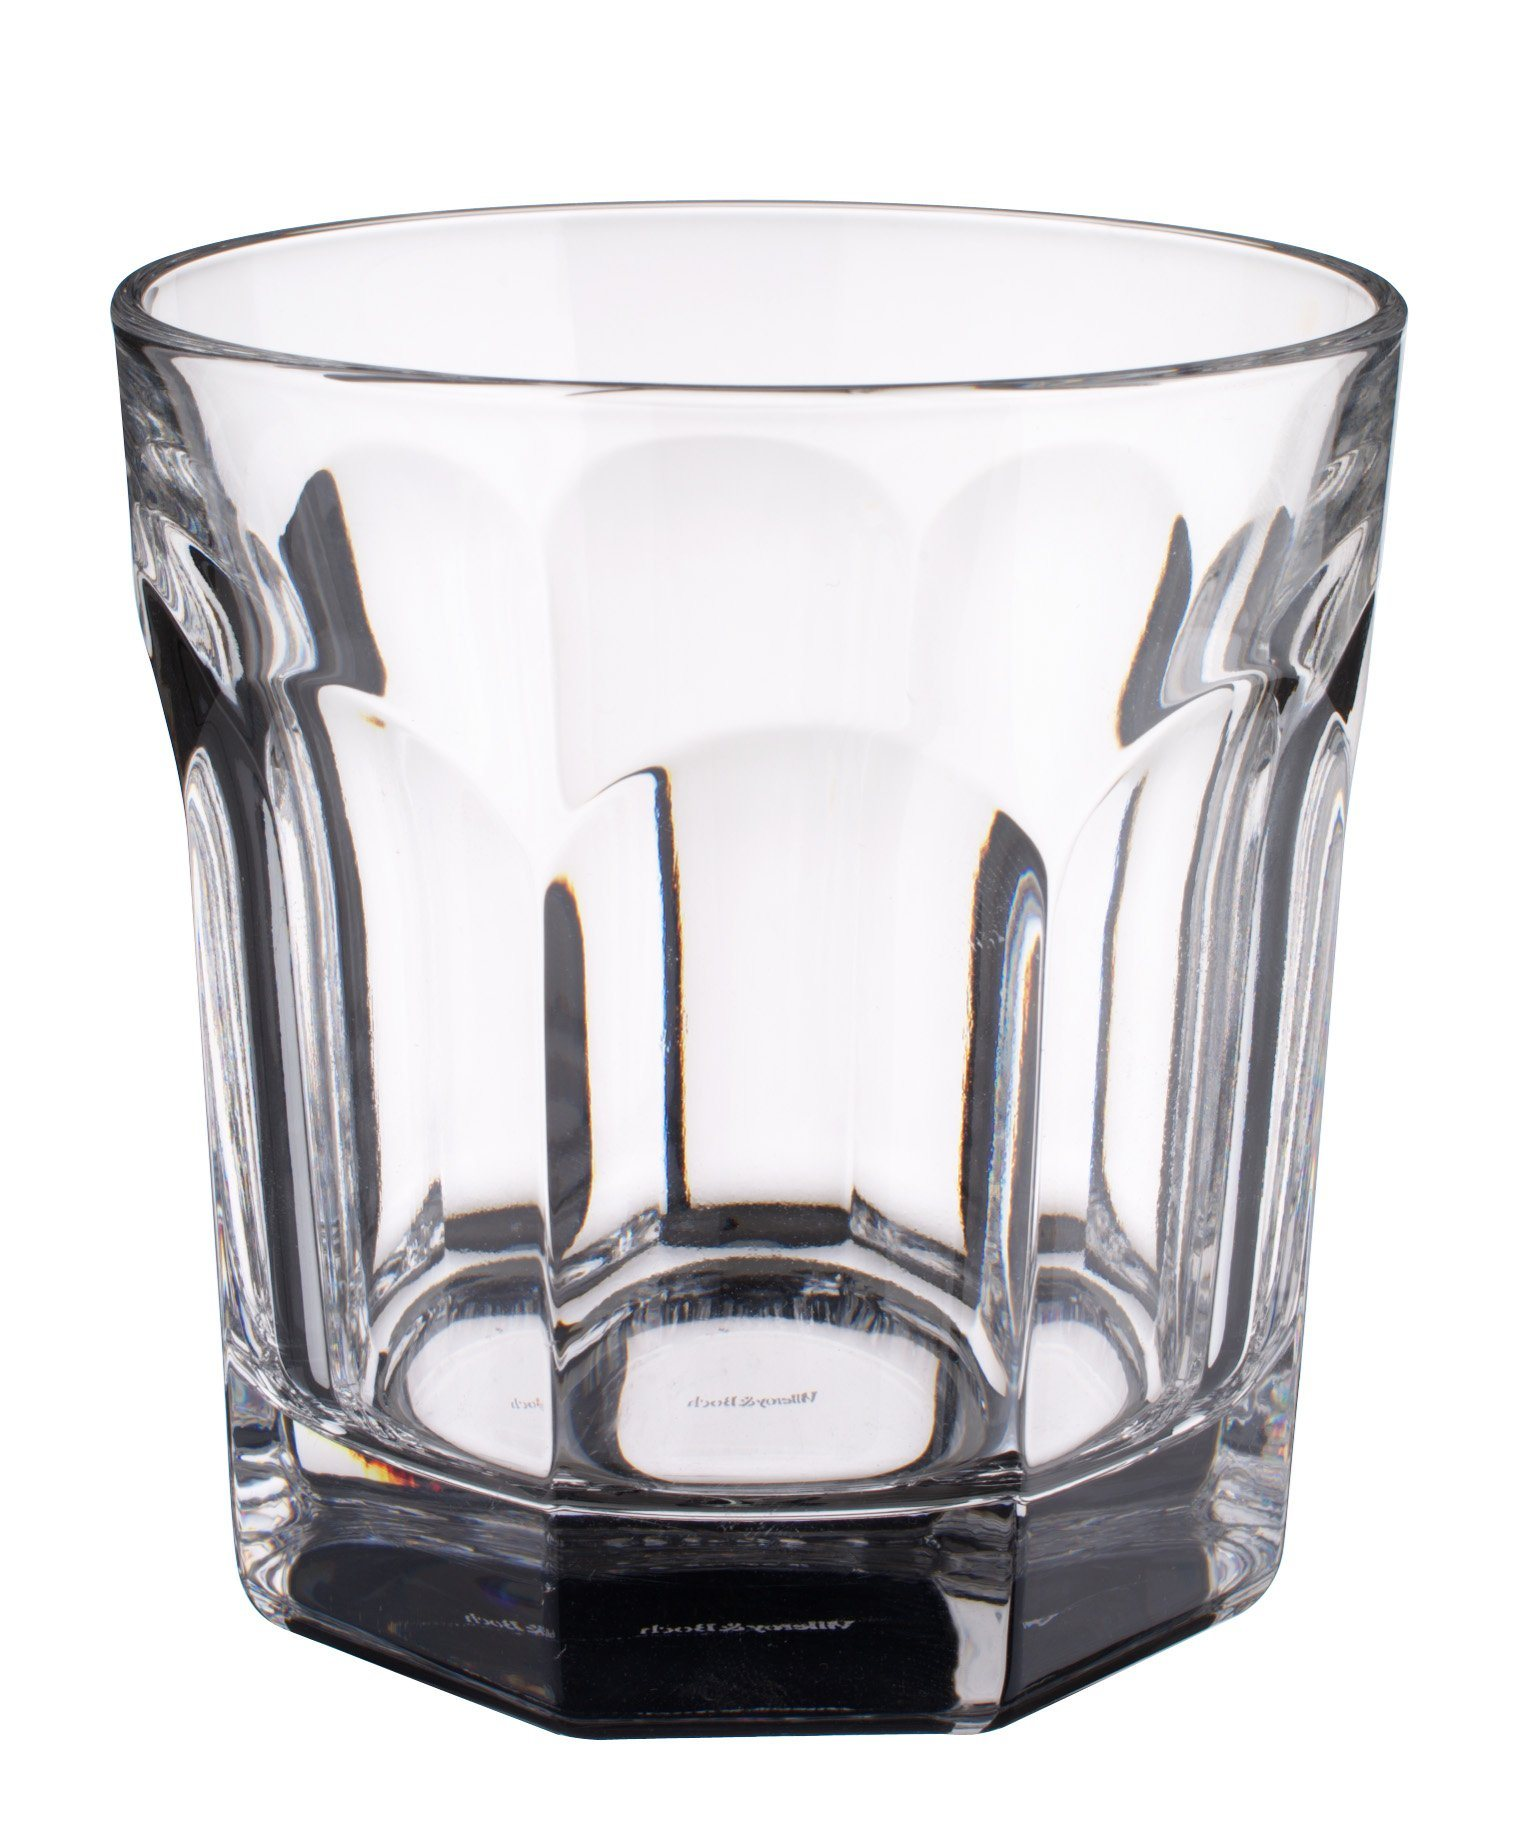 villeroy boch bernadotte whisky glas villeroy boch bernadotte online kaufen bei woonio. Black Bedroom Furniture Sets. Home Design Ideas